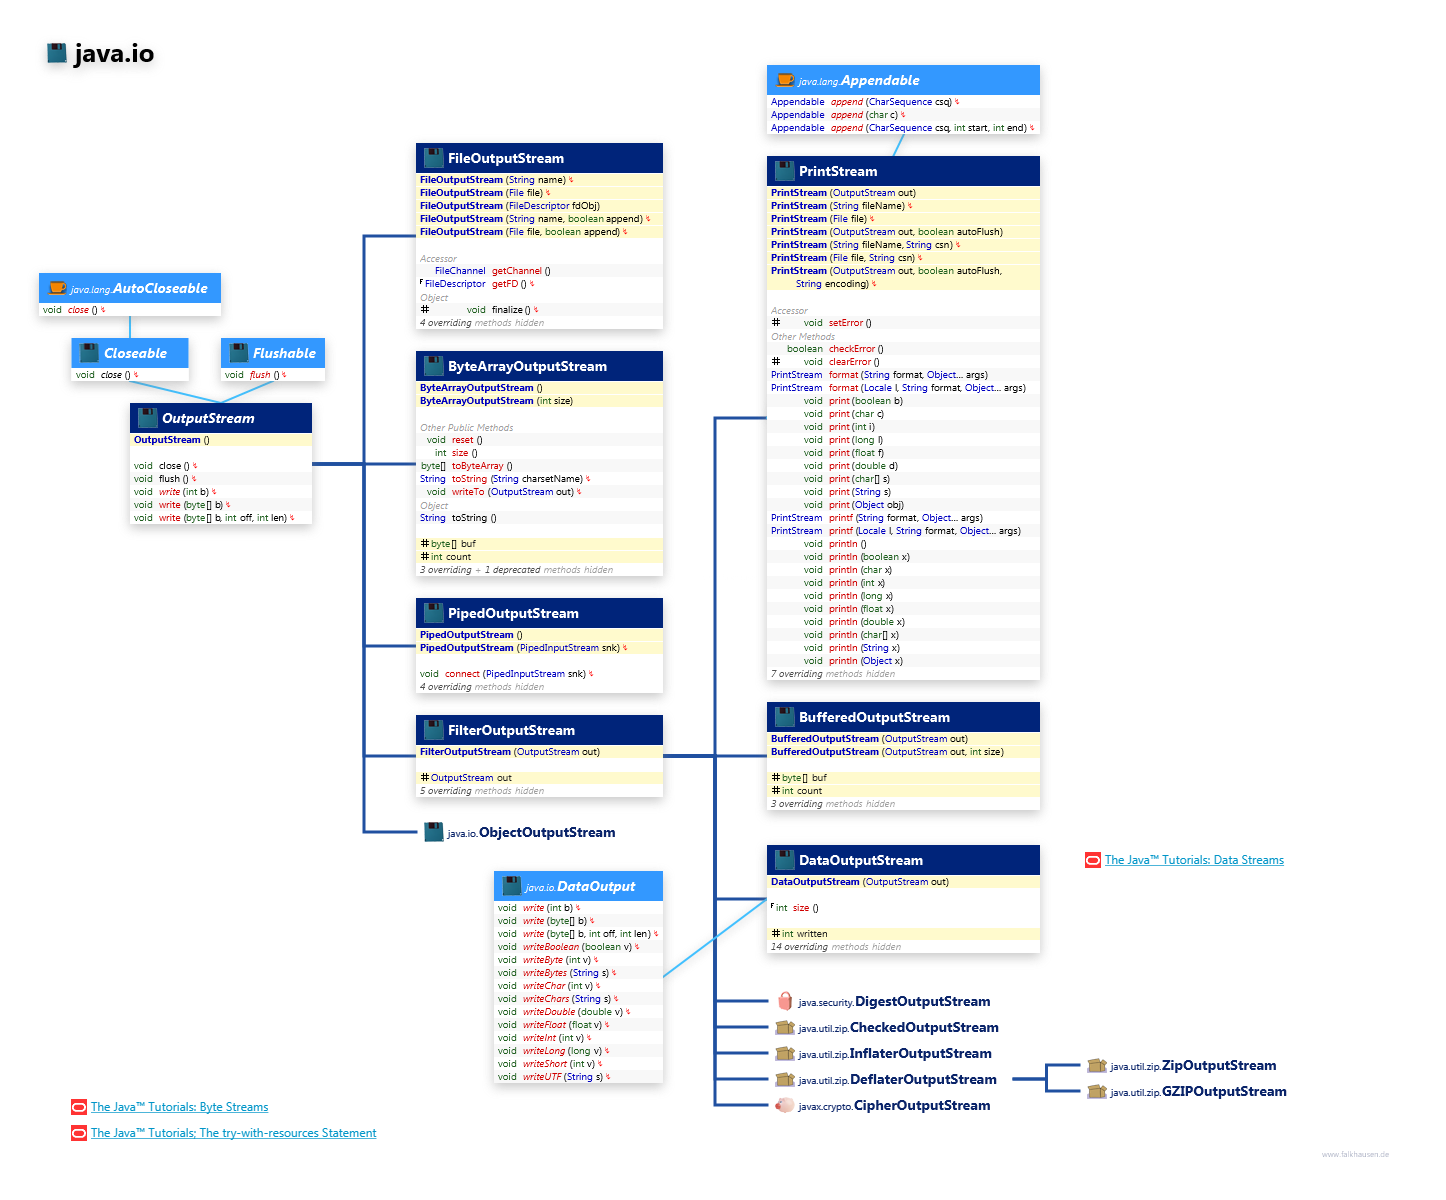 Java Io Outputstream